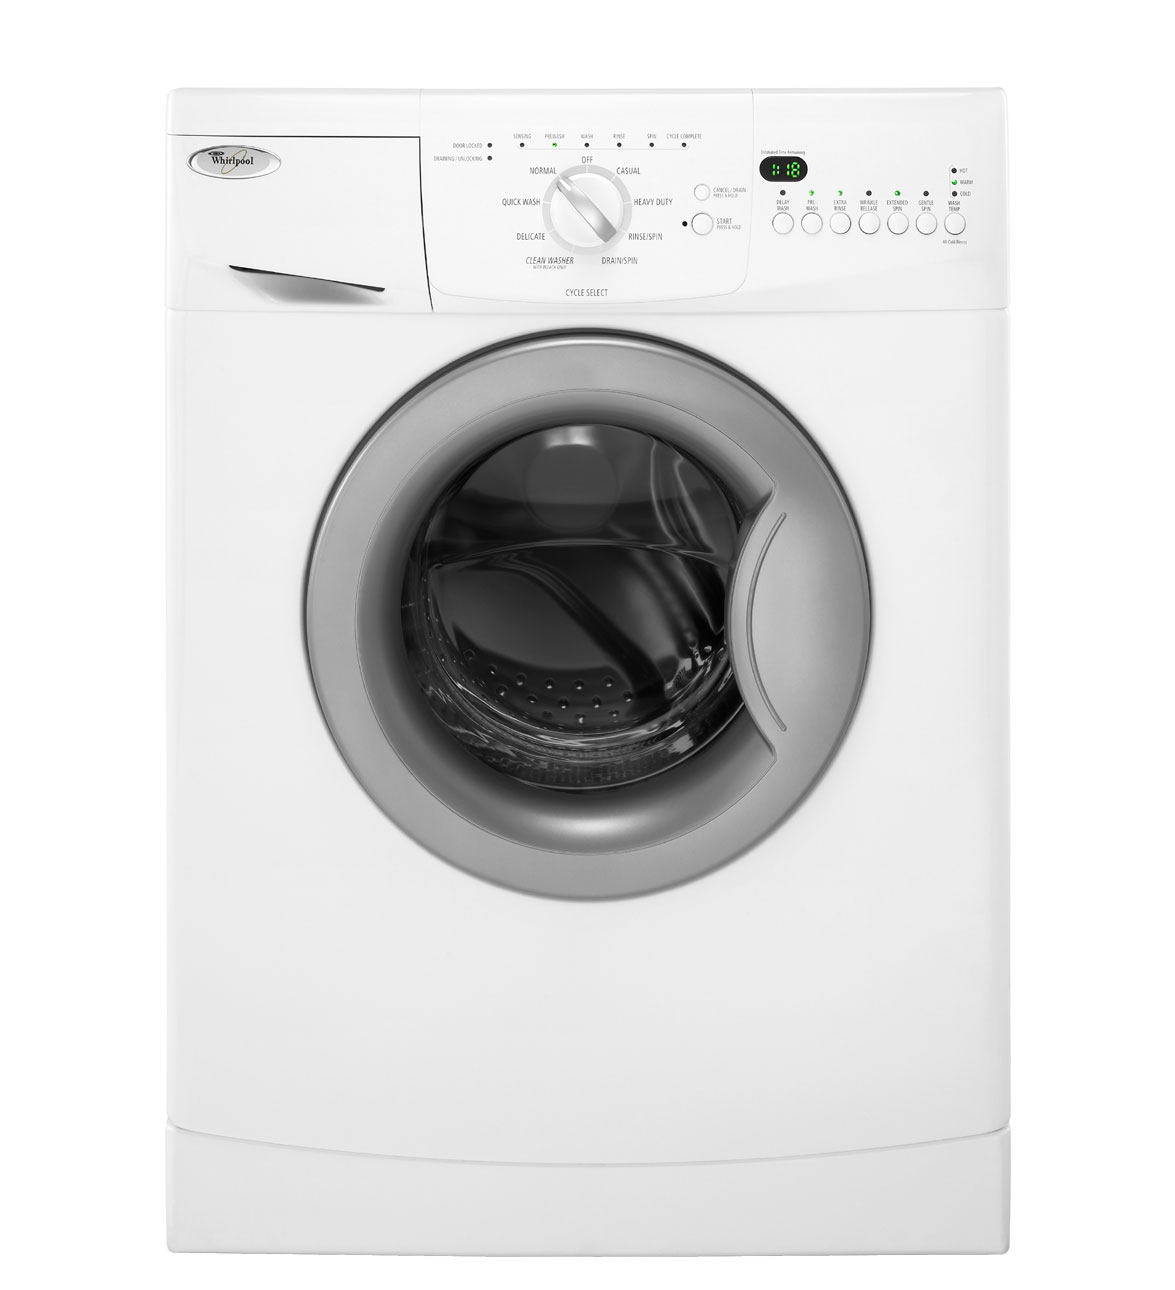 Manual Raeder Whirlpool Wfc7500vw Washer Service Manual